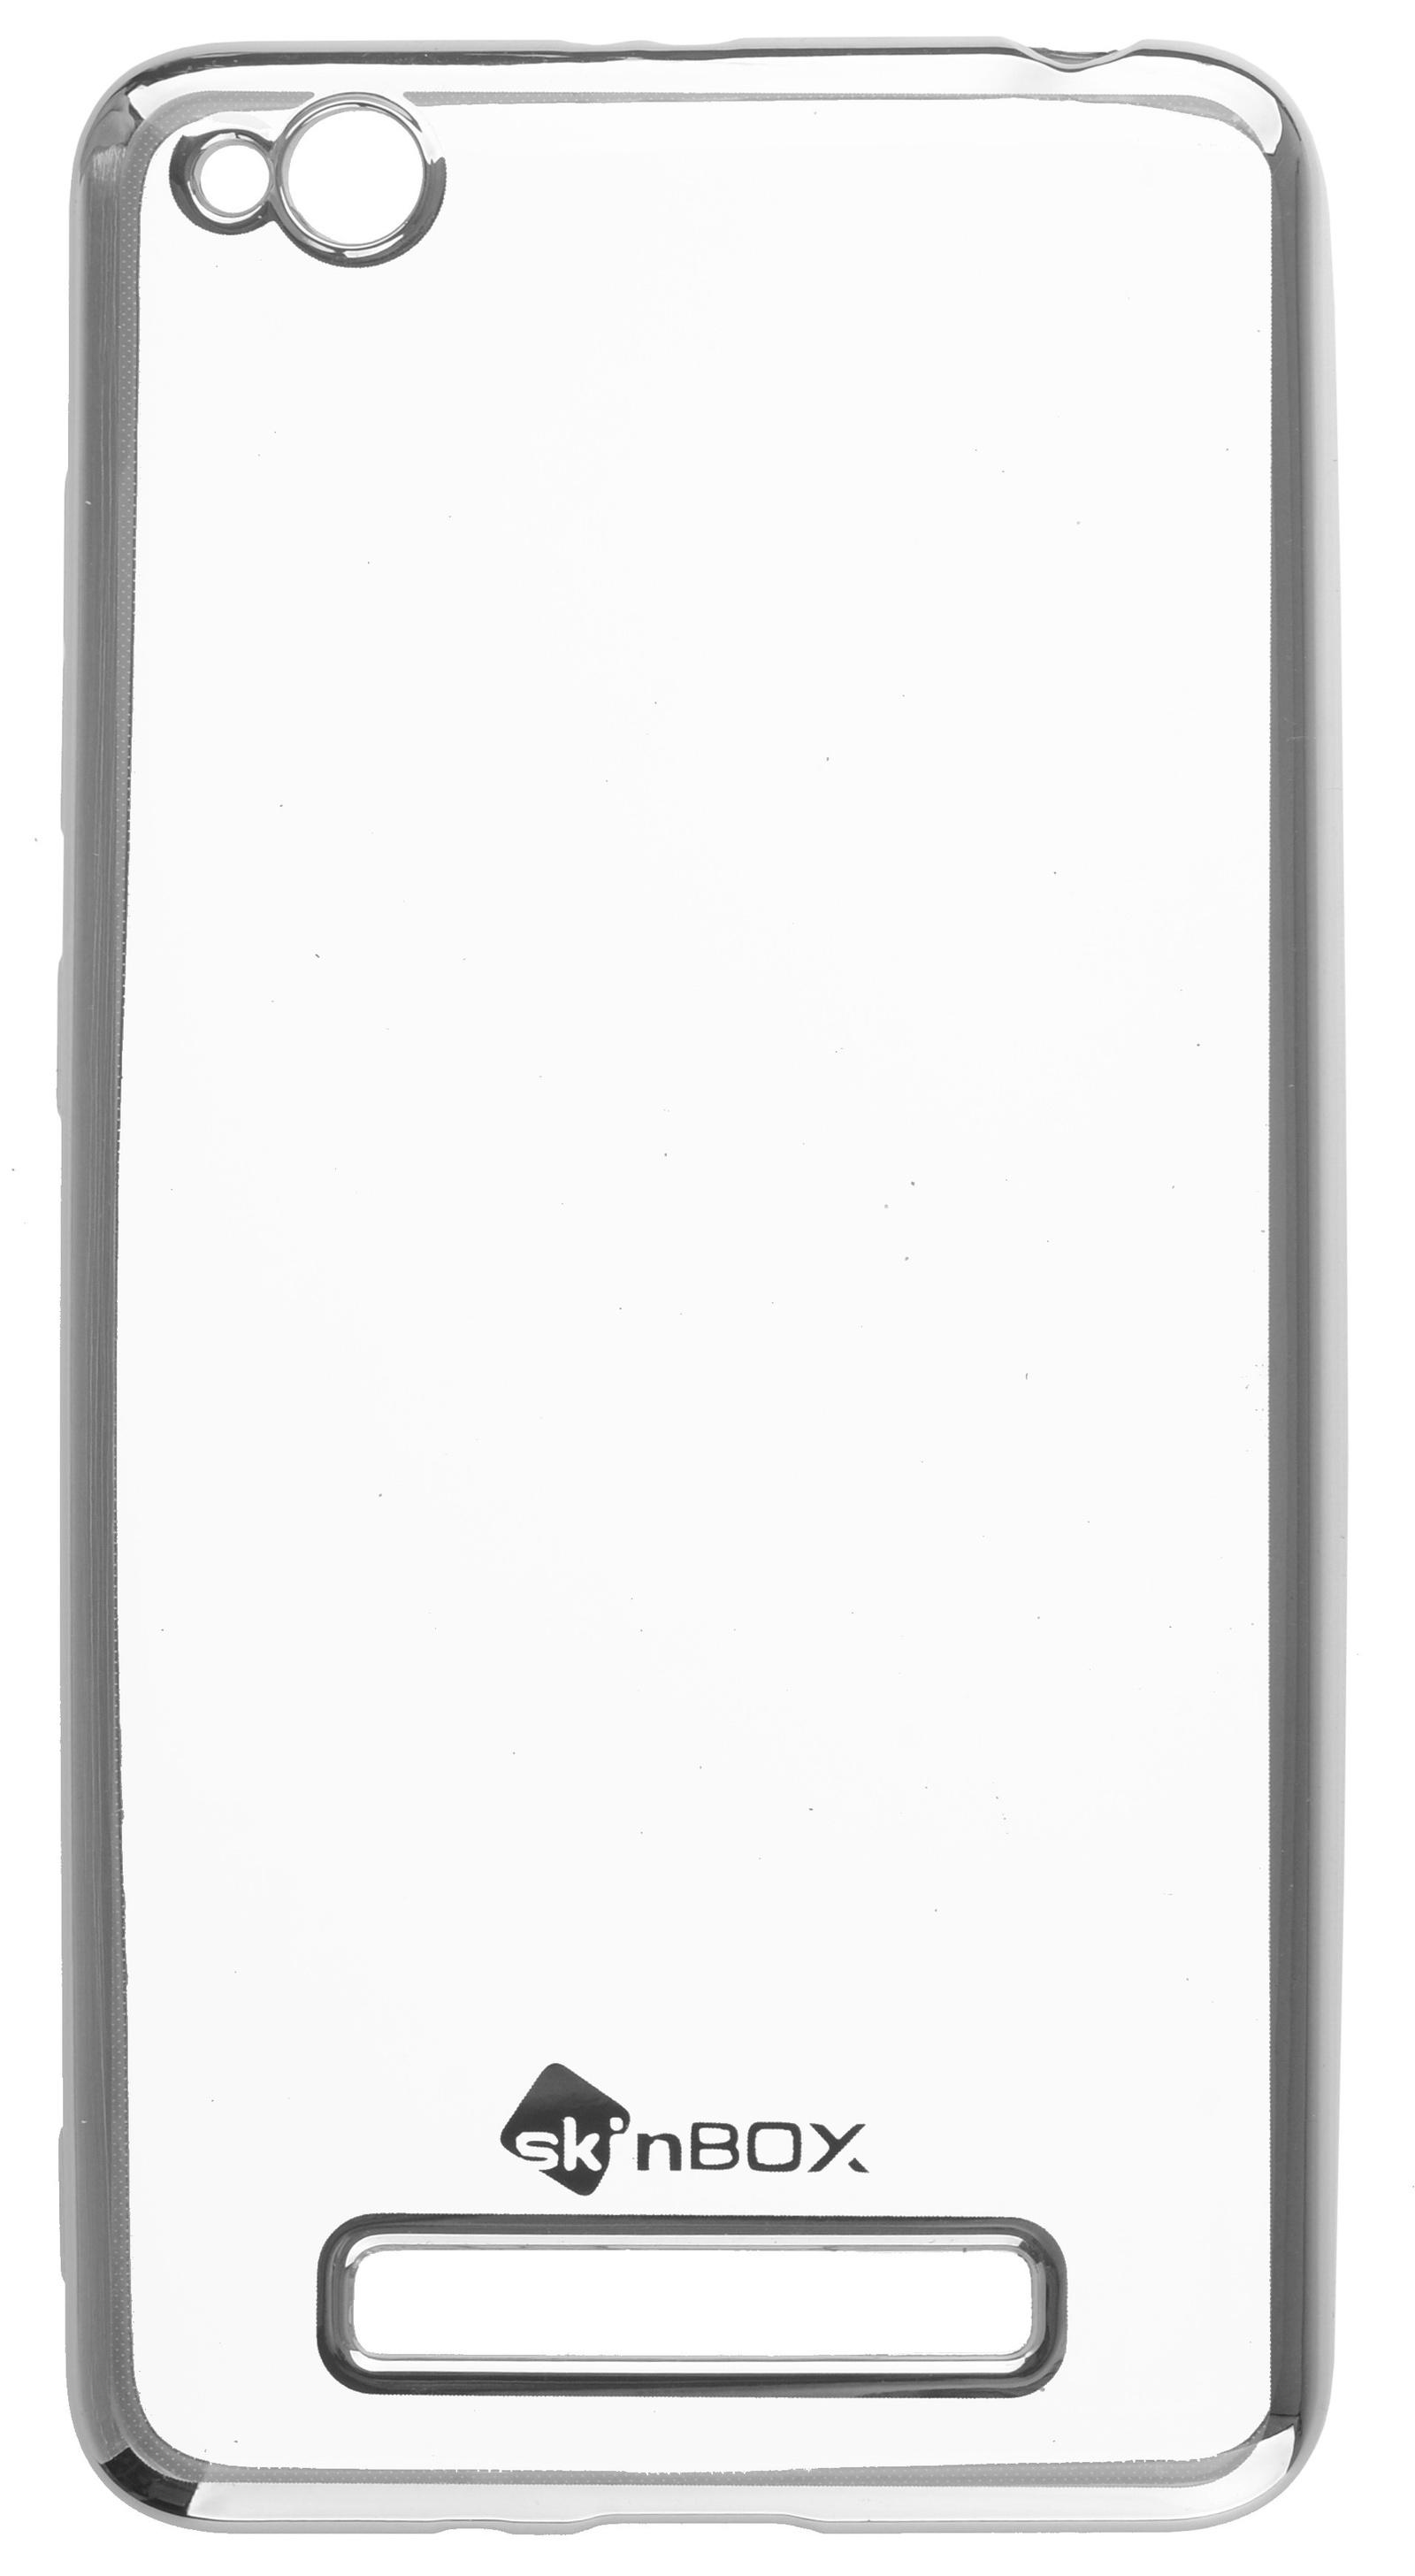 Чехол для сотового телефона skinBOX Silicone chrome border, 4630042529472, серебристый чехол для asus zenfone go zb500kg skinbox 4people silicone chrome border case темно серебристый